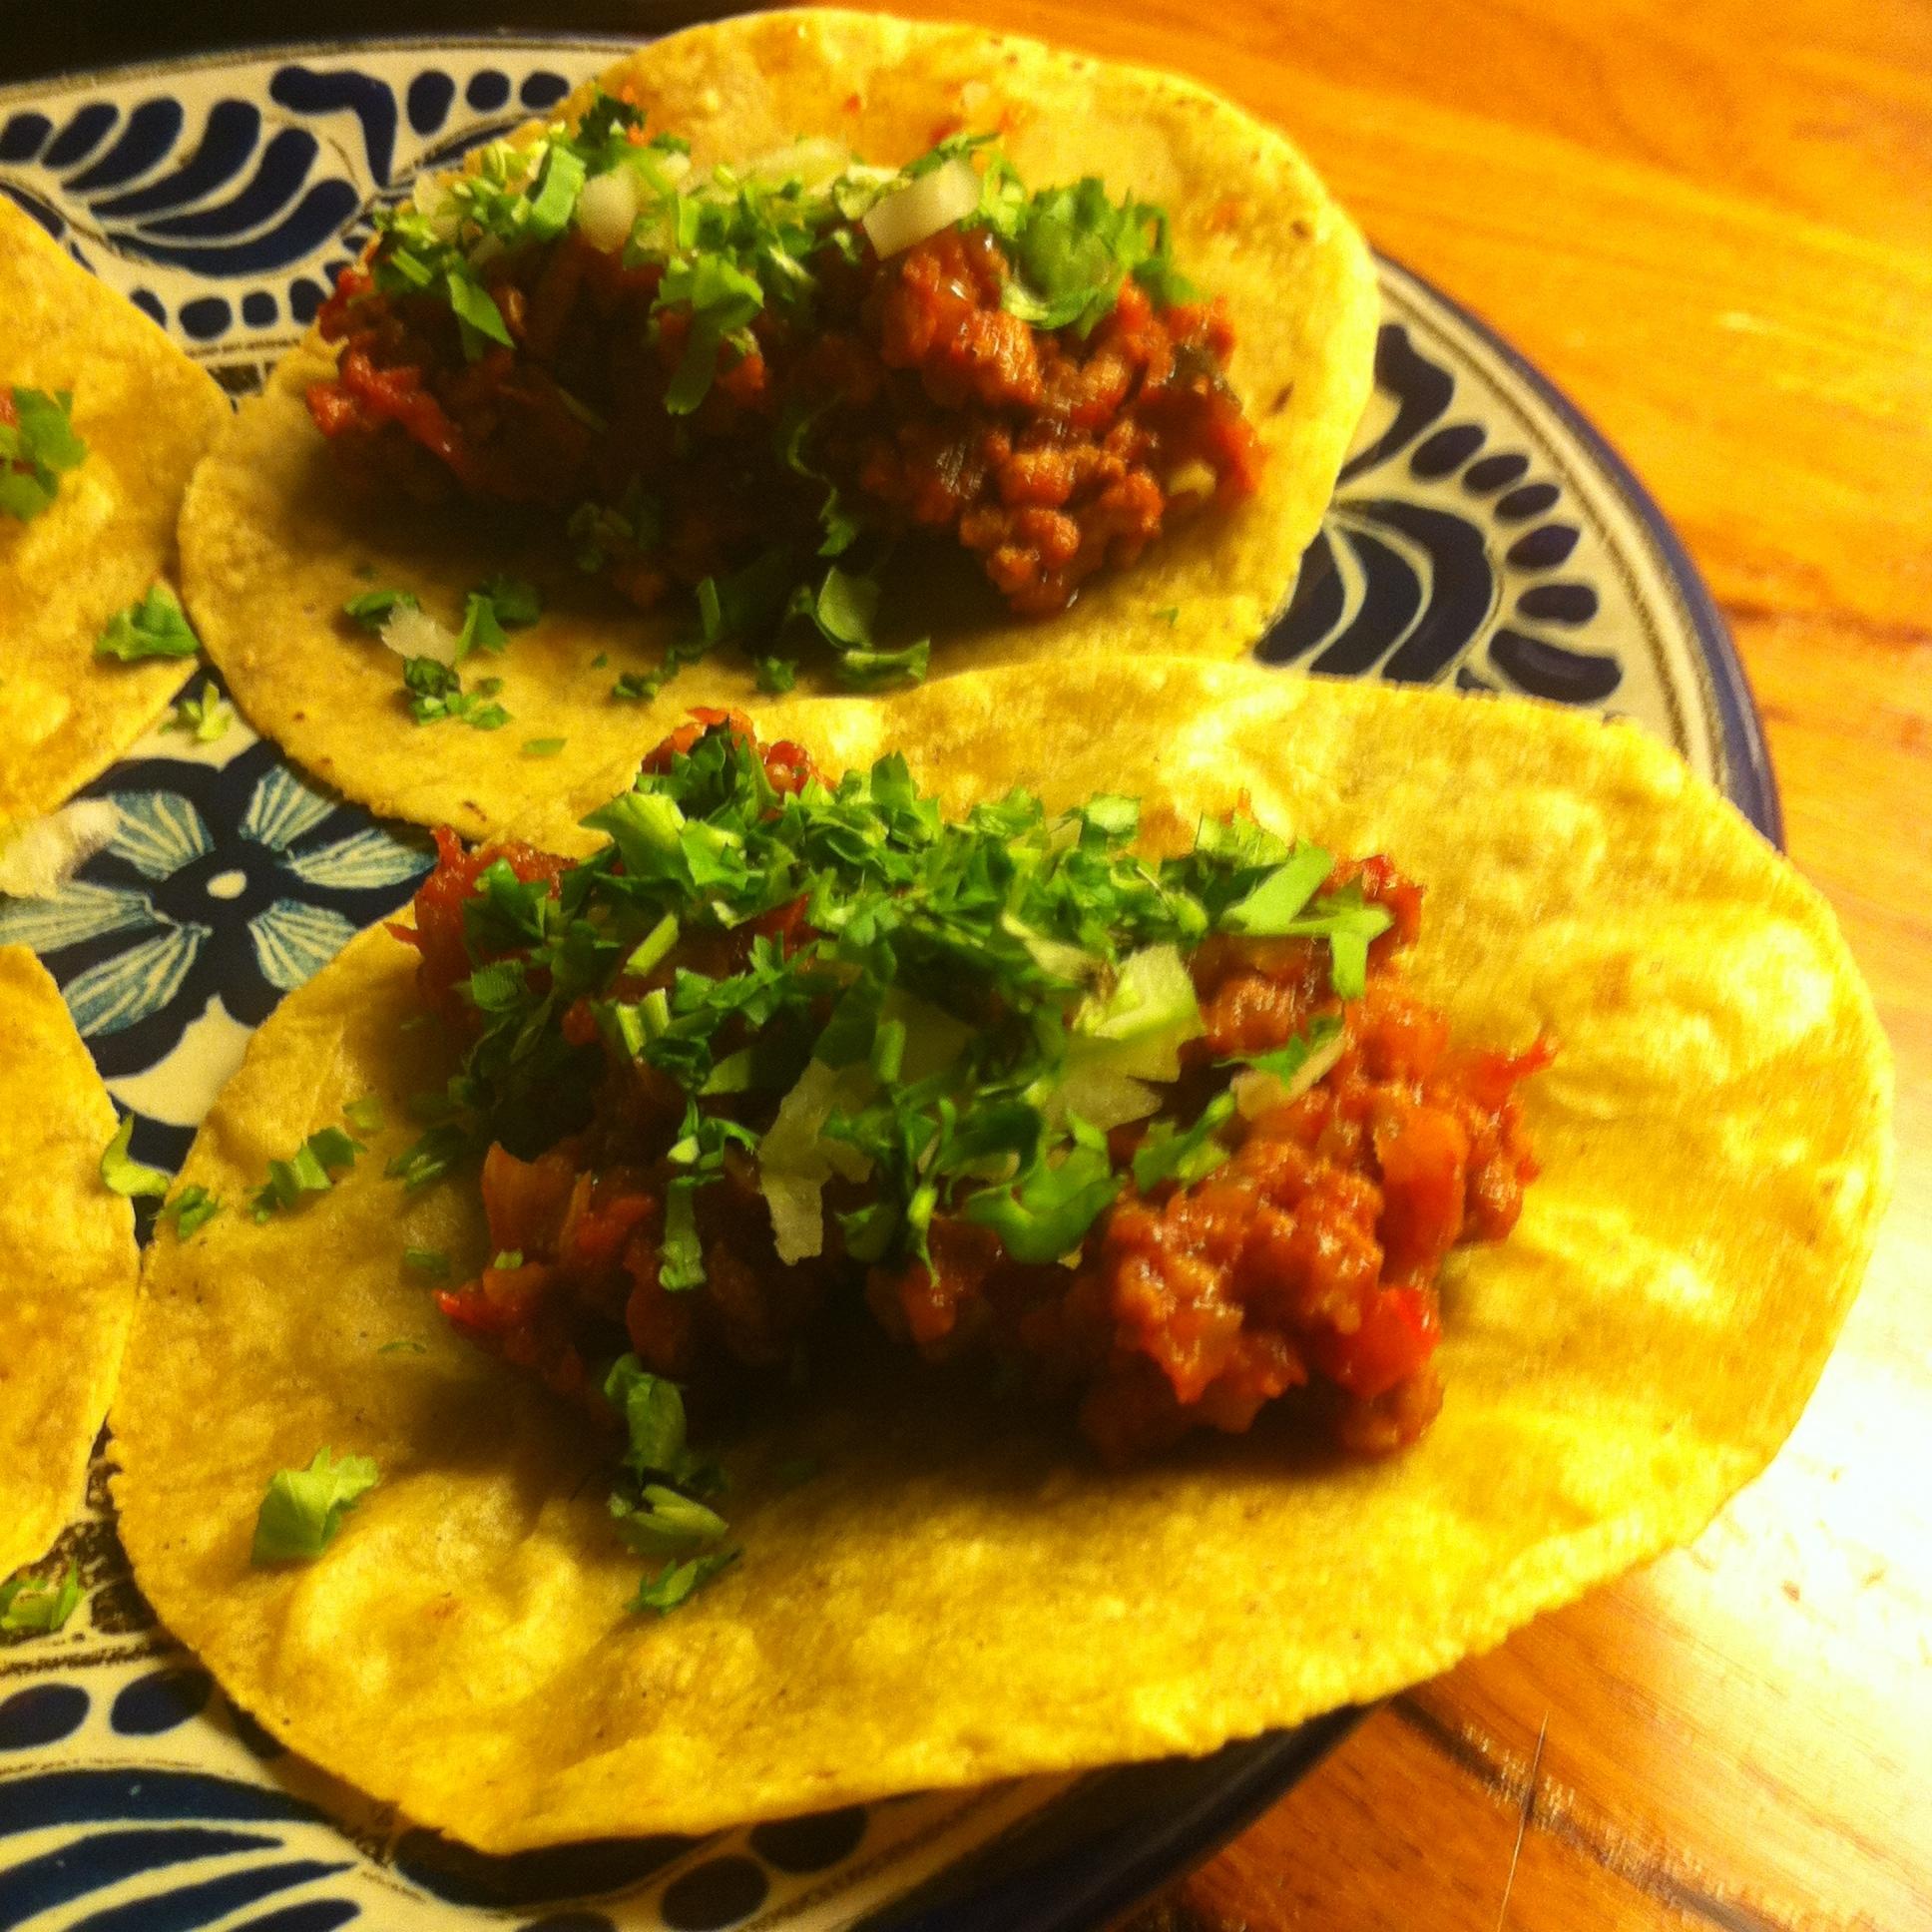 Hibiscus Dinners sociale middager: hjemmelaget tacos